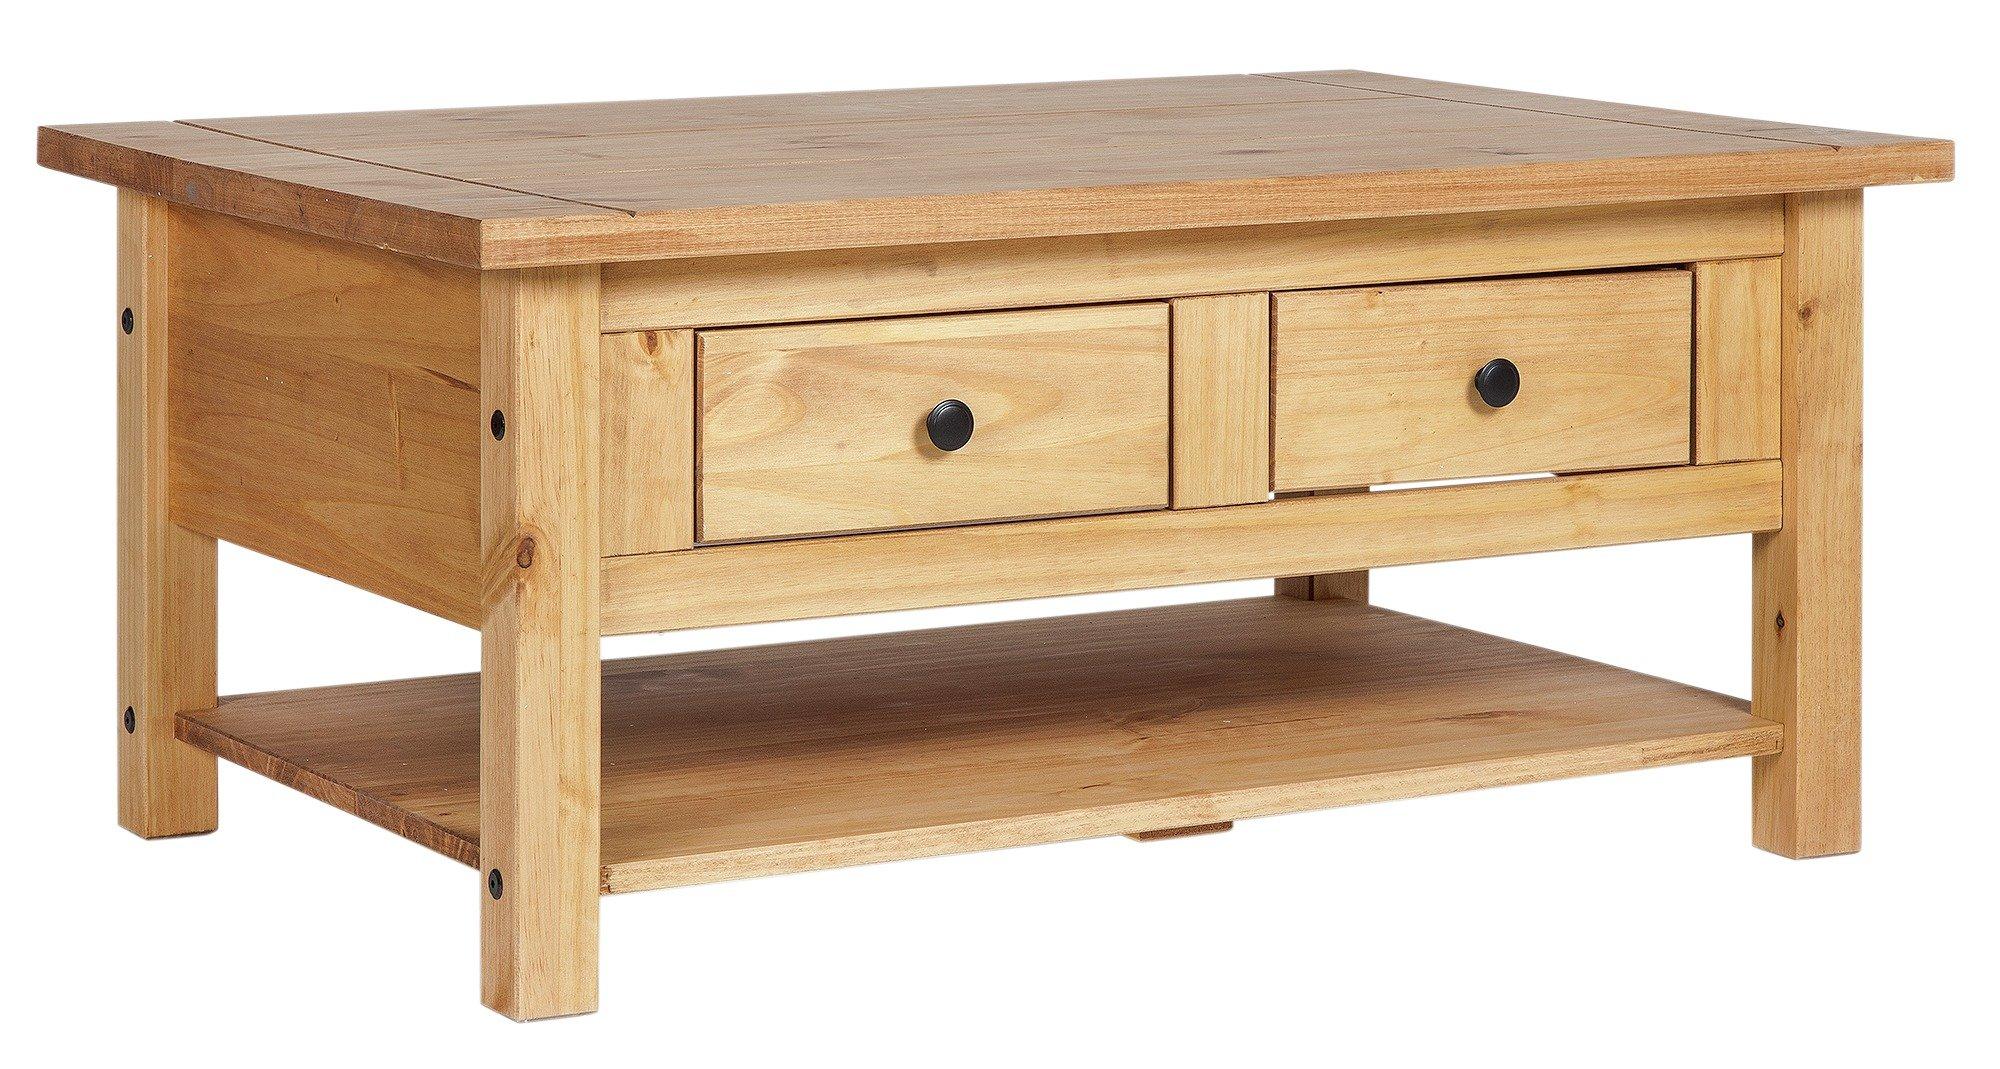 Argos Home San Diego 2 Drawers 1 Shelf Coffee Table - Pine